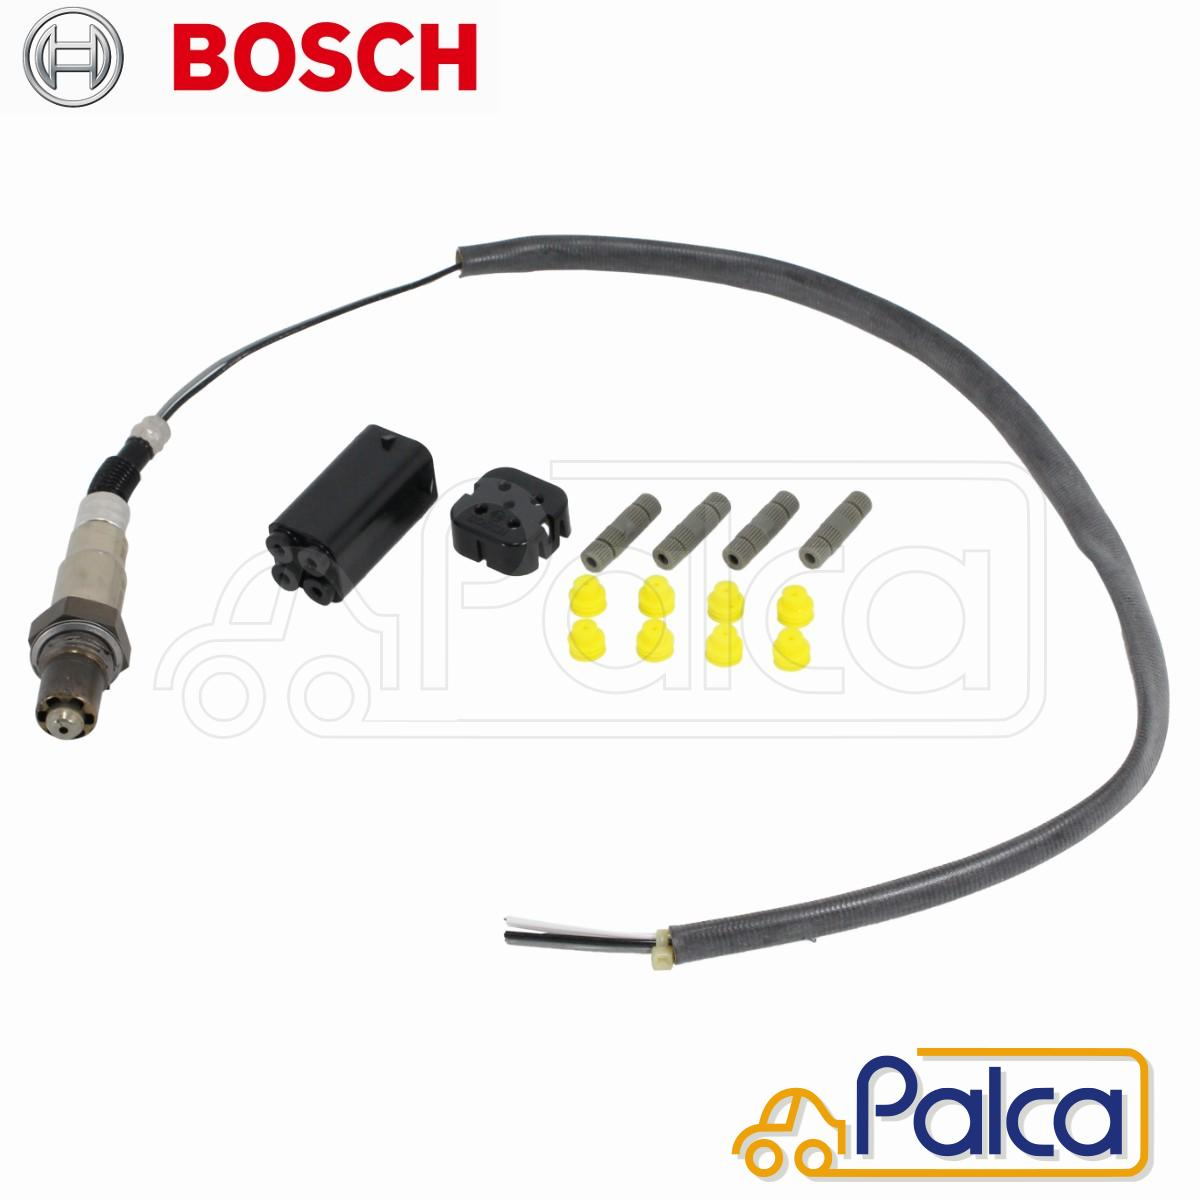 Oxygen Sensor for Mercedes W210 W220 R170 W163 E320 E430 S350 S430 ML350 SLK320